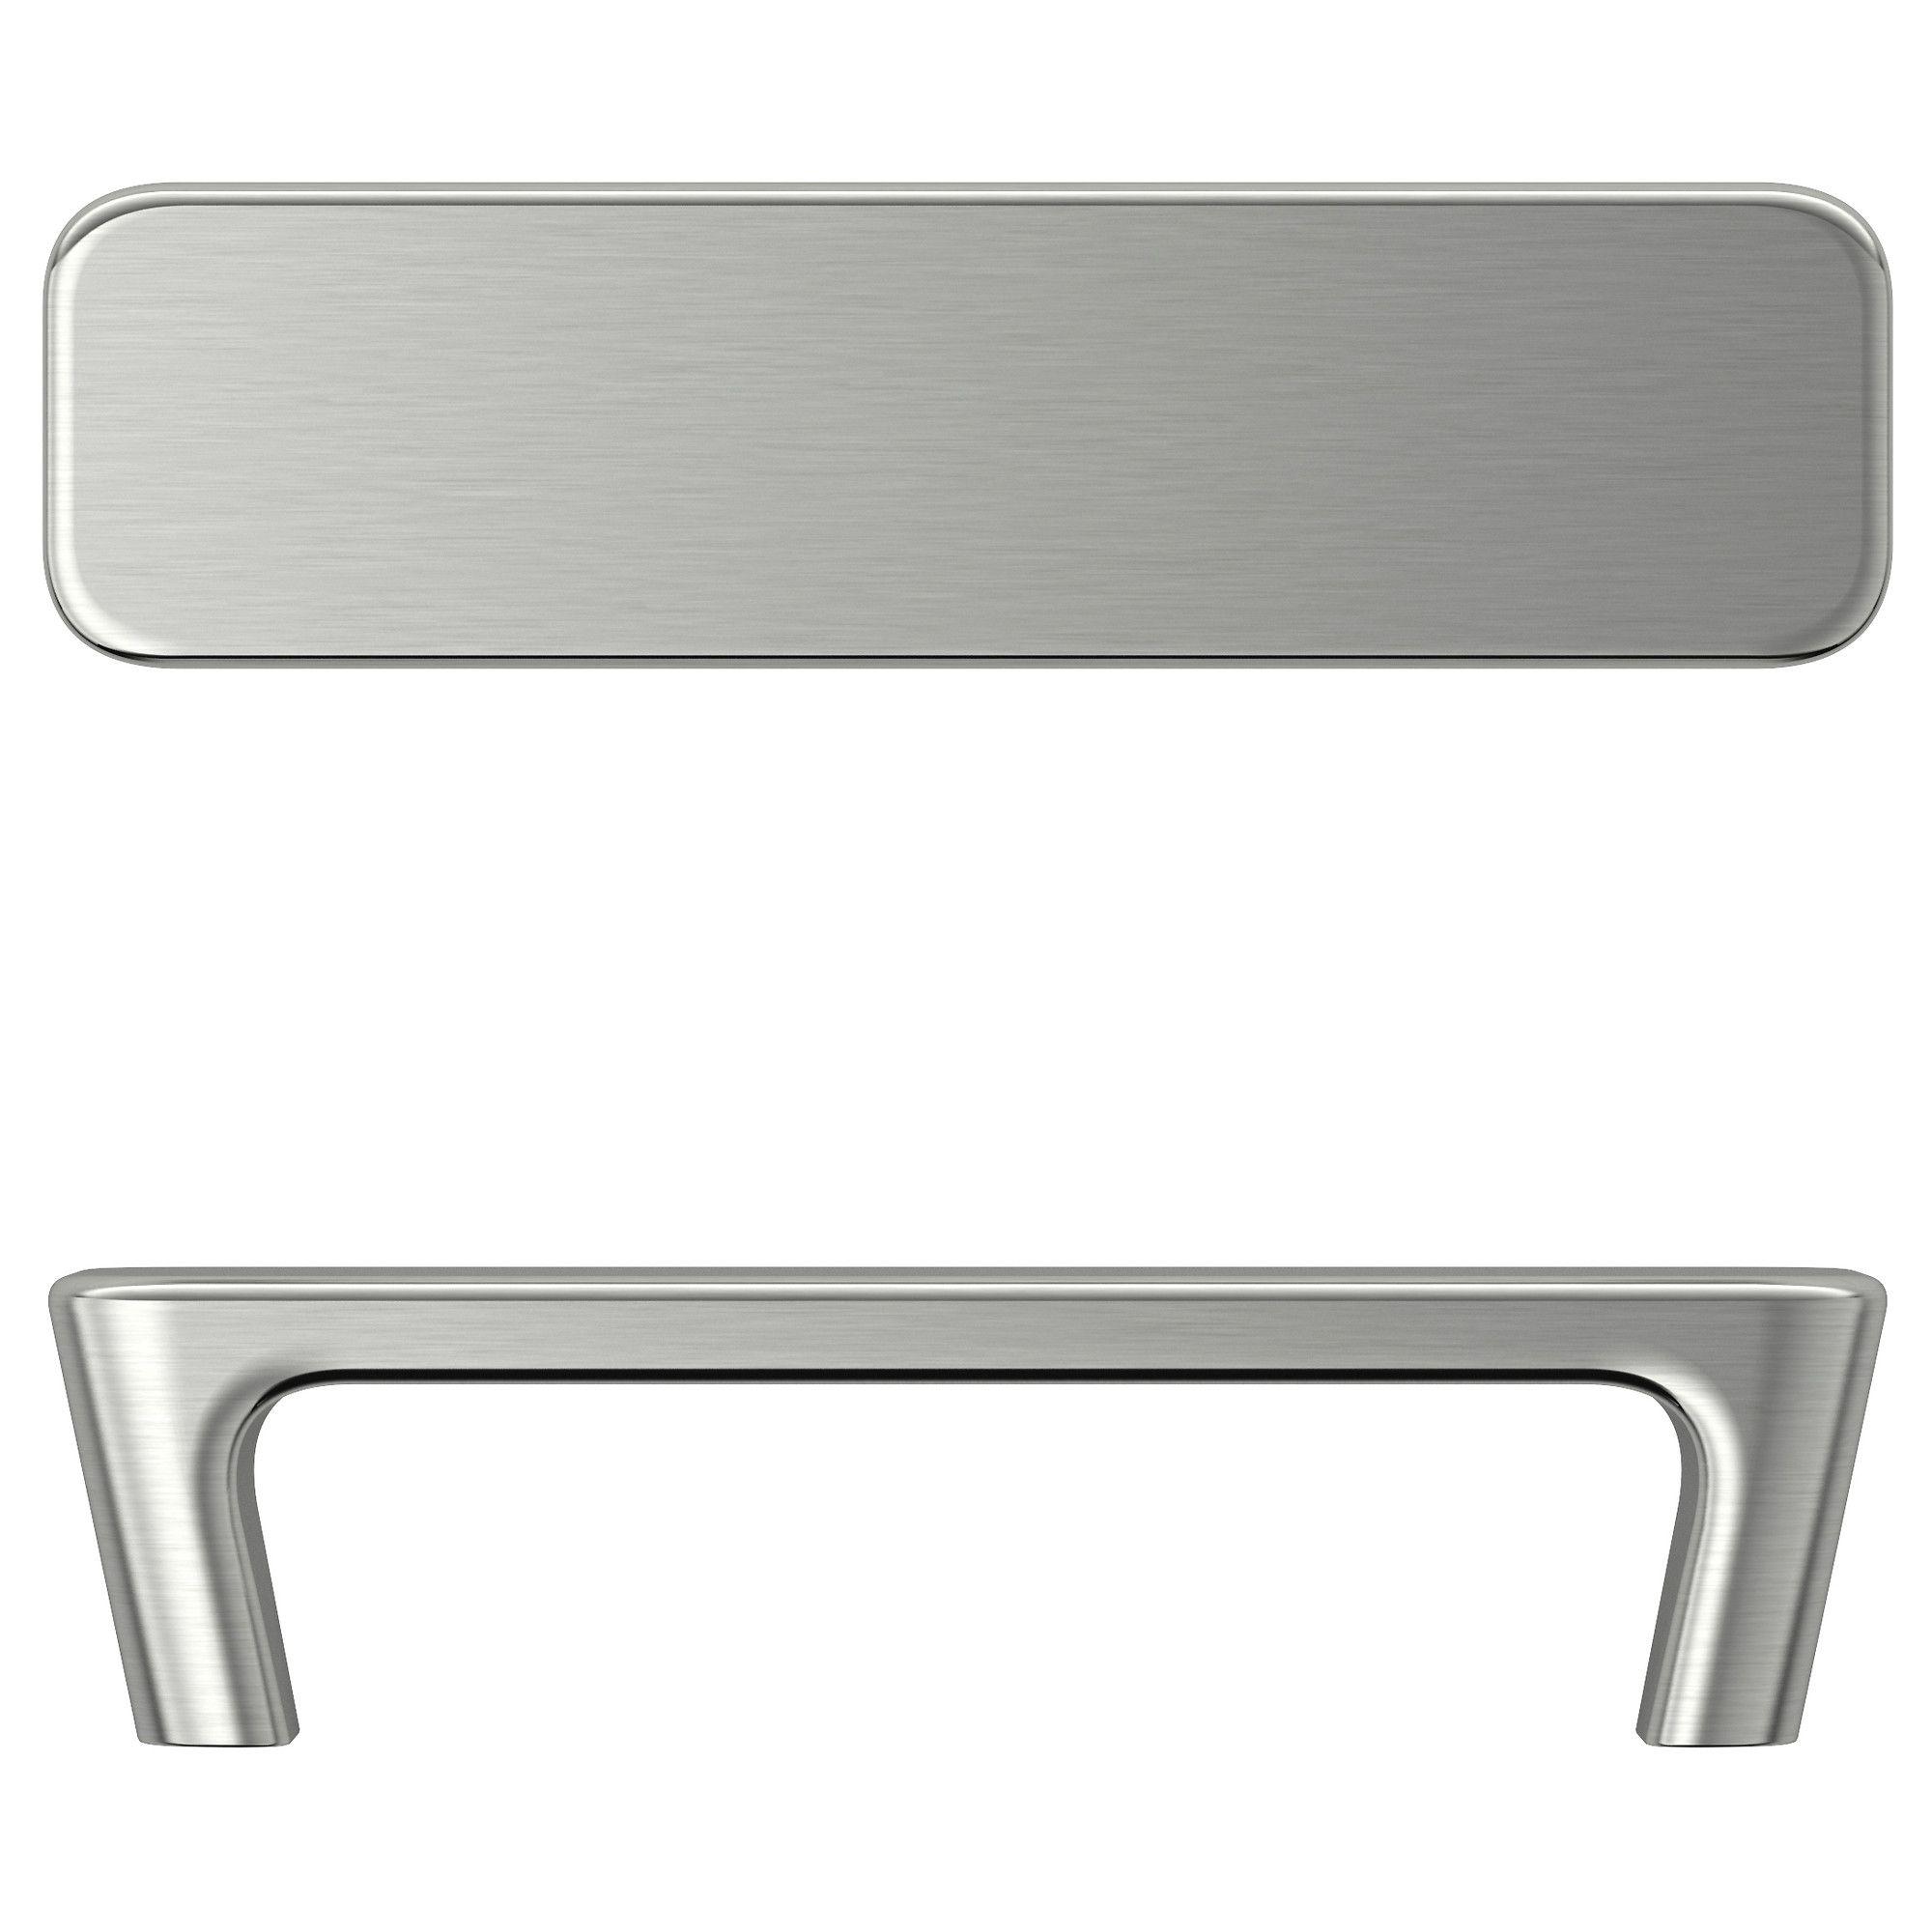 Bastig handle ikea article number ikea for Ikea kitchen handles and knobs